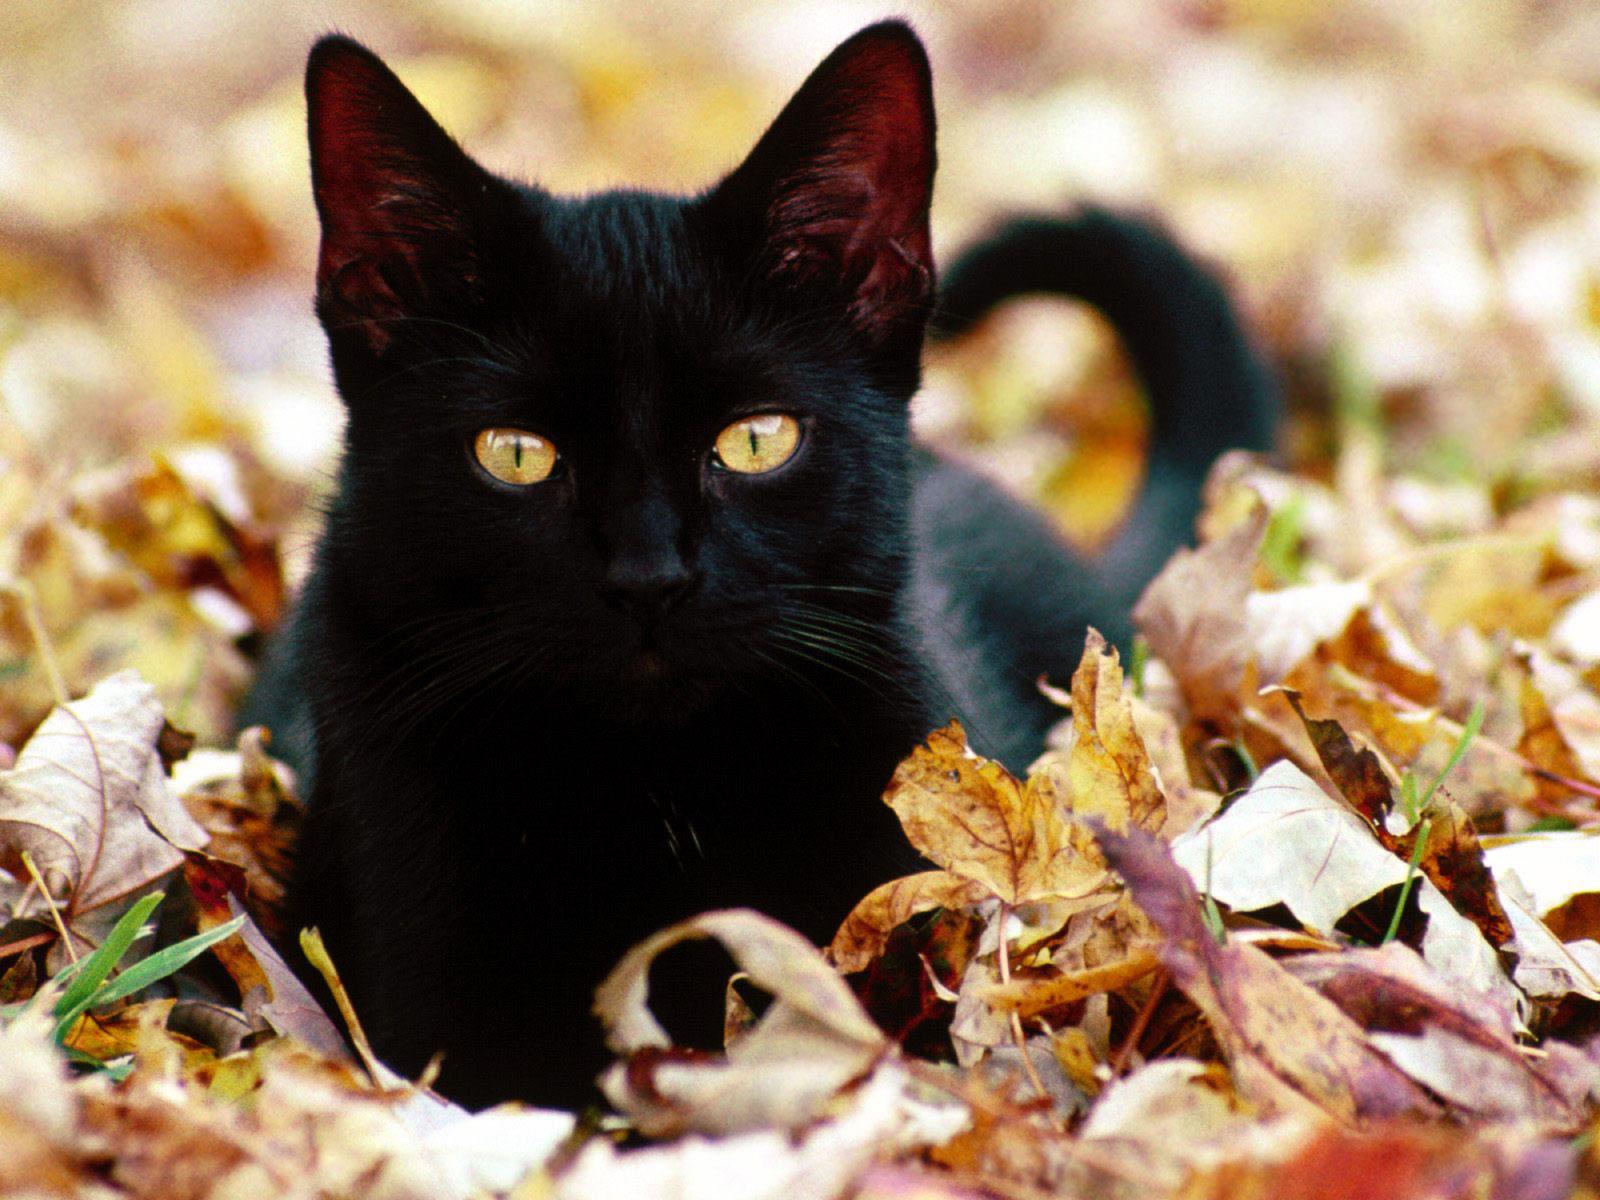 Cute Black Cat Fall Leaves 195971 HD Wallpaper Res 1600x1200 1600x1200